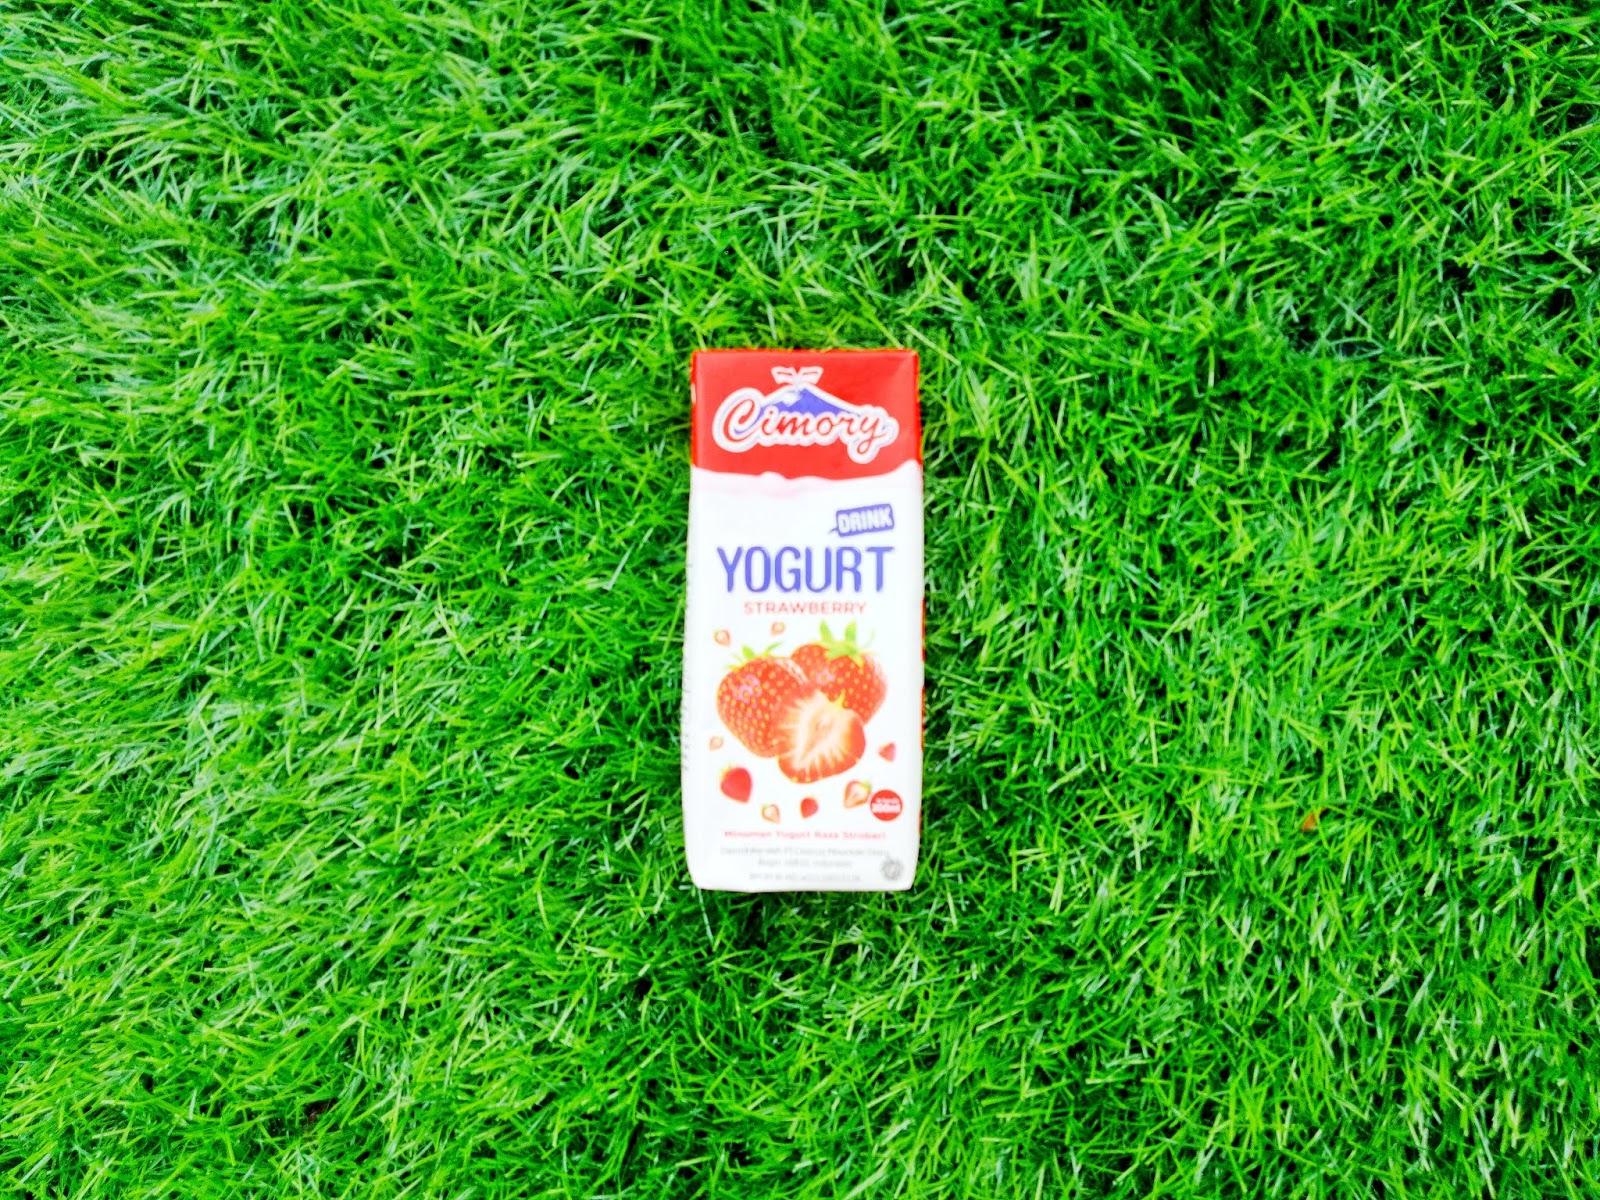 yoghurt cimory